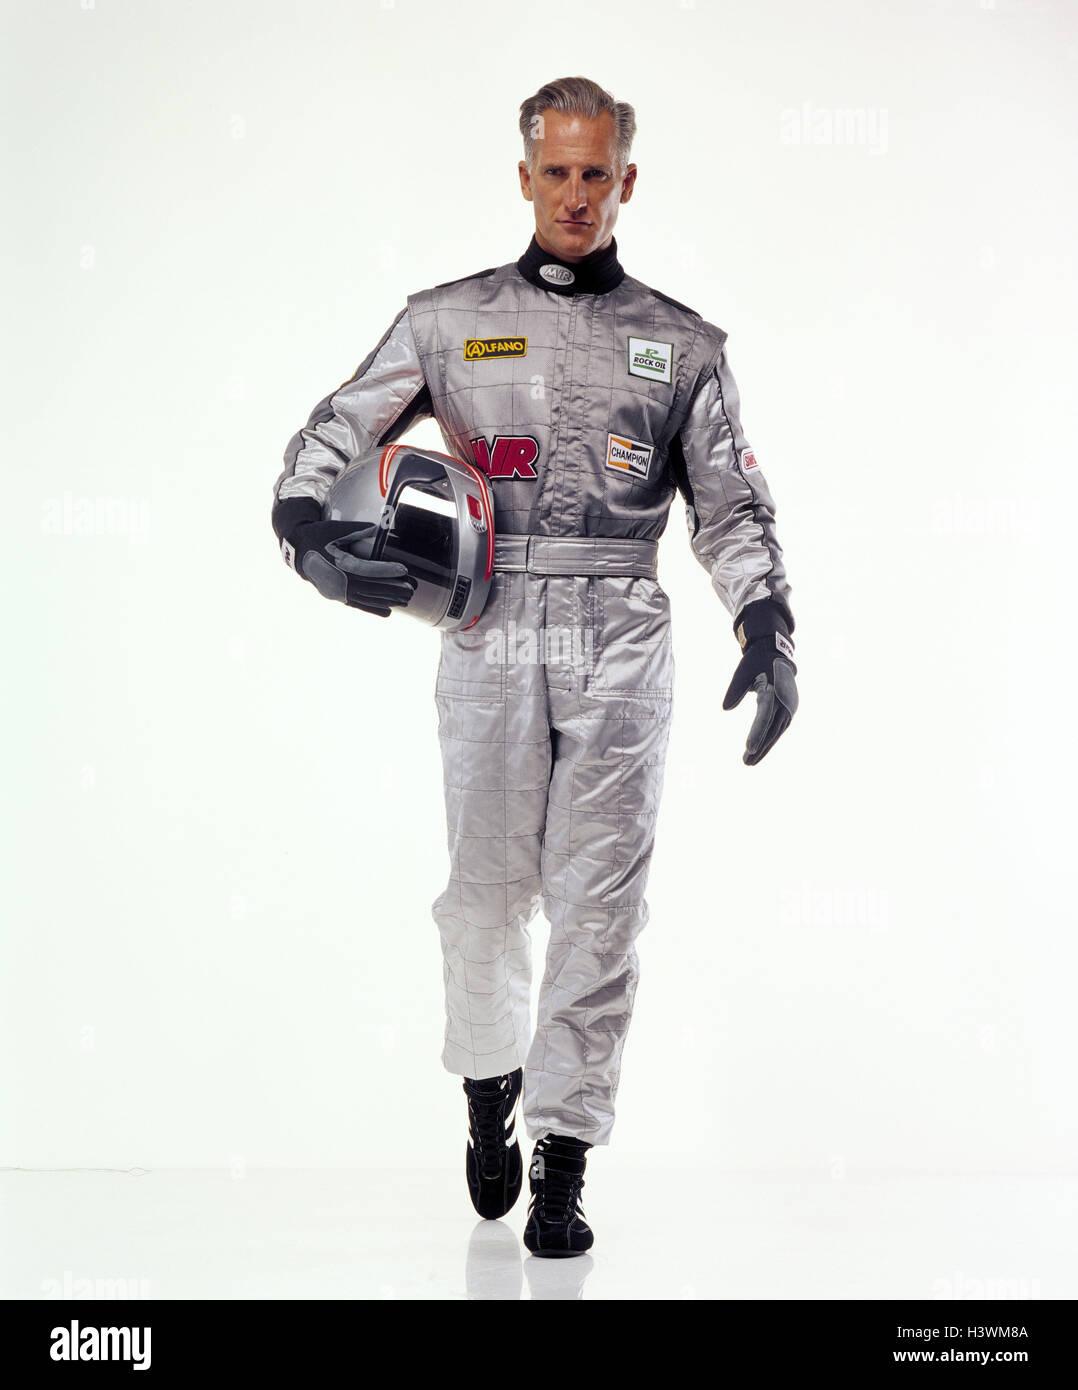 Motor Sport racing driver, complessivamente, casco, argento, movimento go sport, sport racing, uomo racing tuta, Immagini Stock